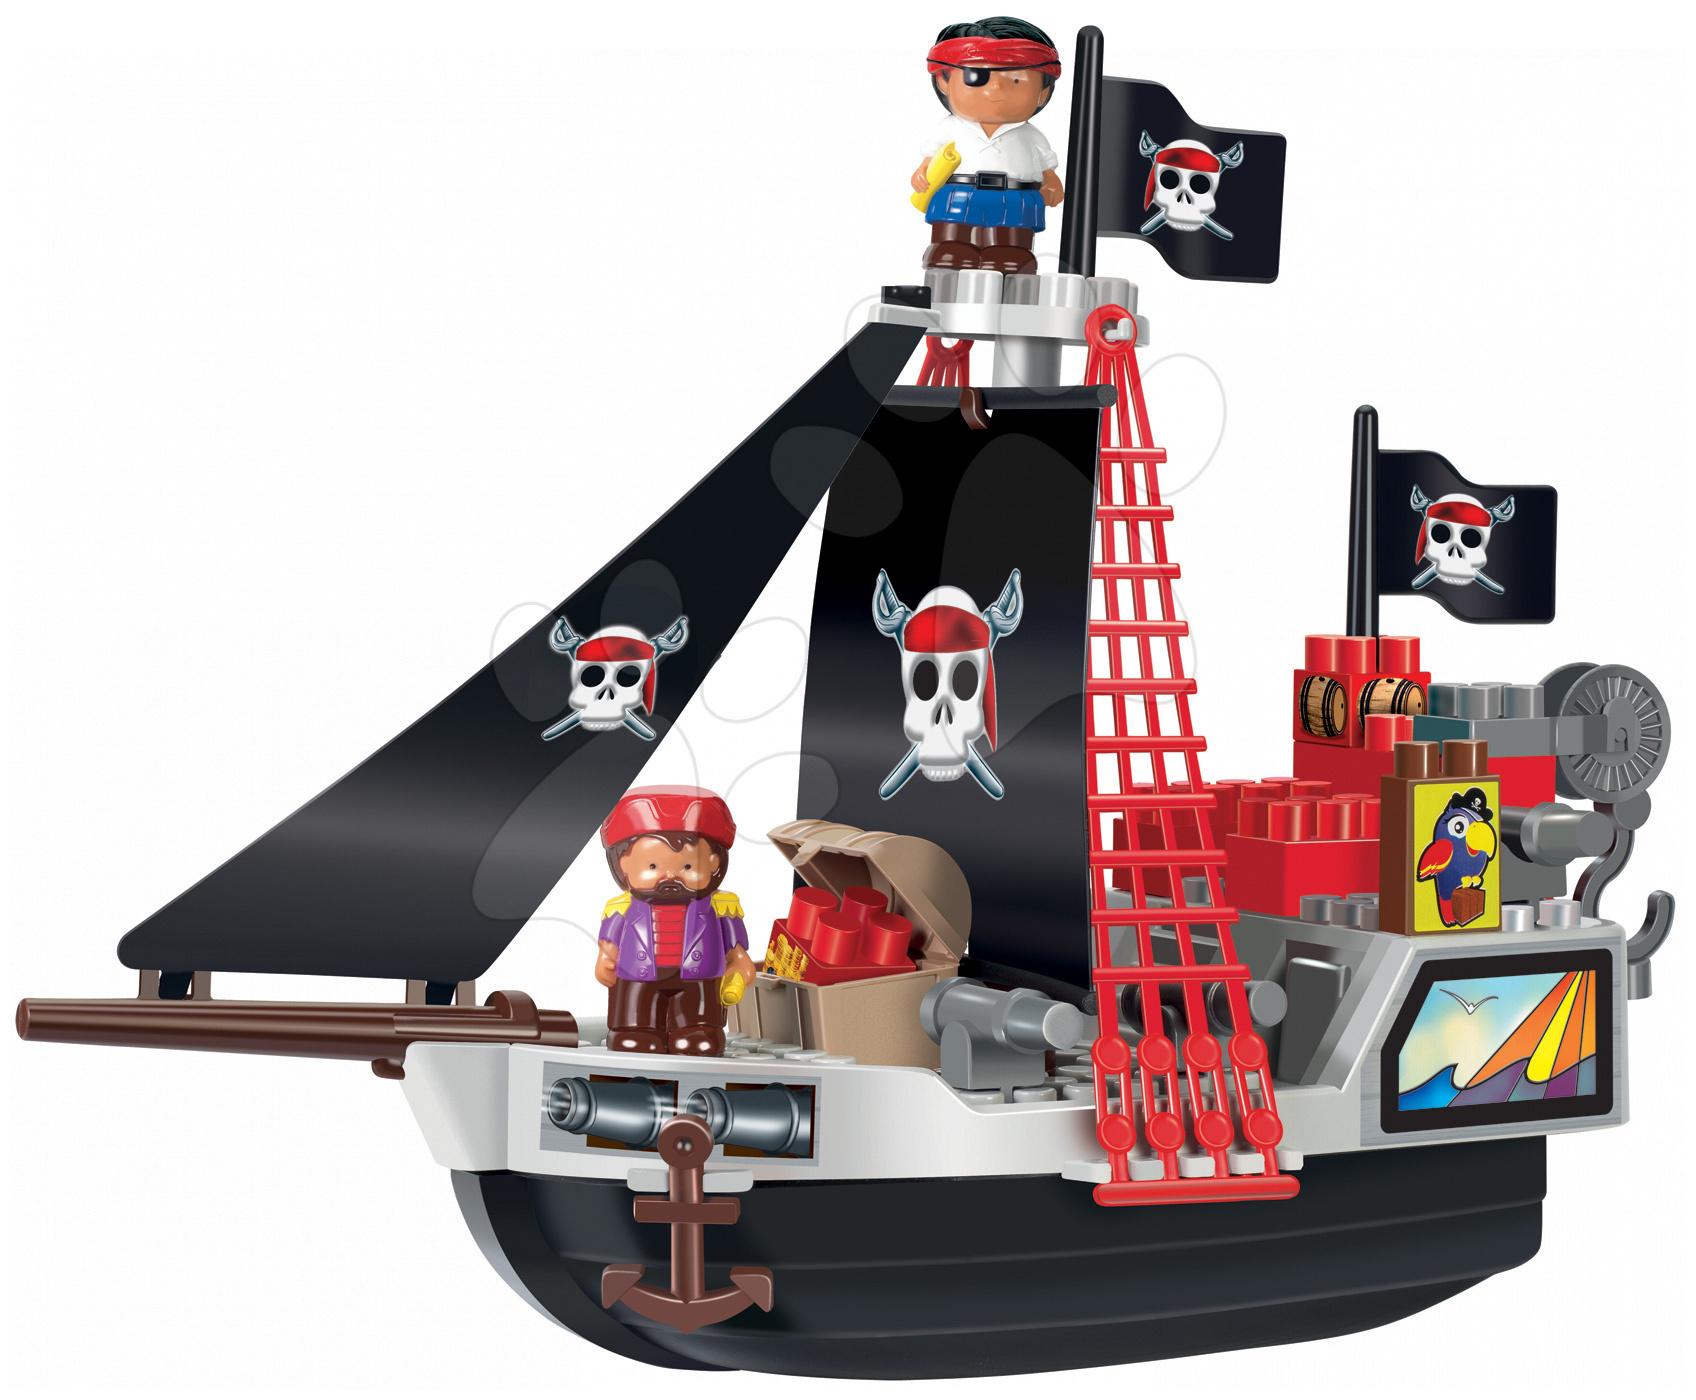 Otroške kocke Piratska ladja z zakladom Abrick Écoiffier 29 delov od 18 mes